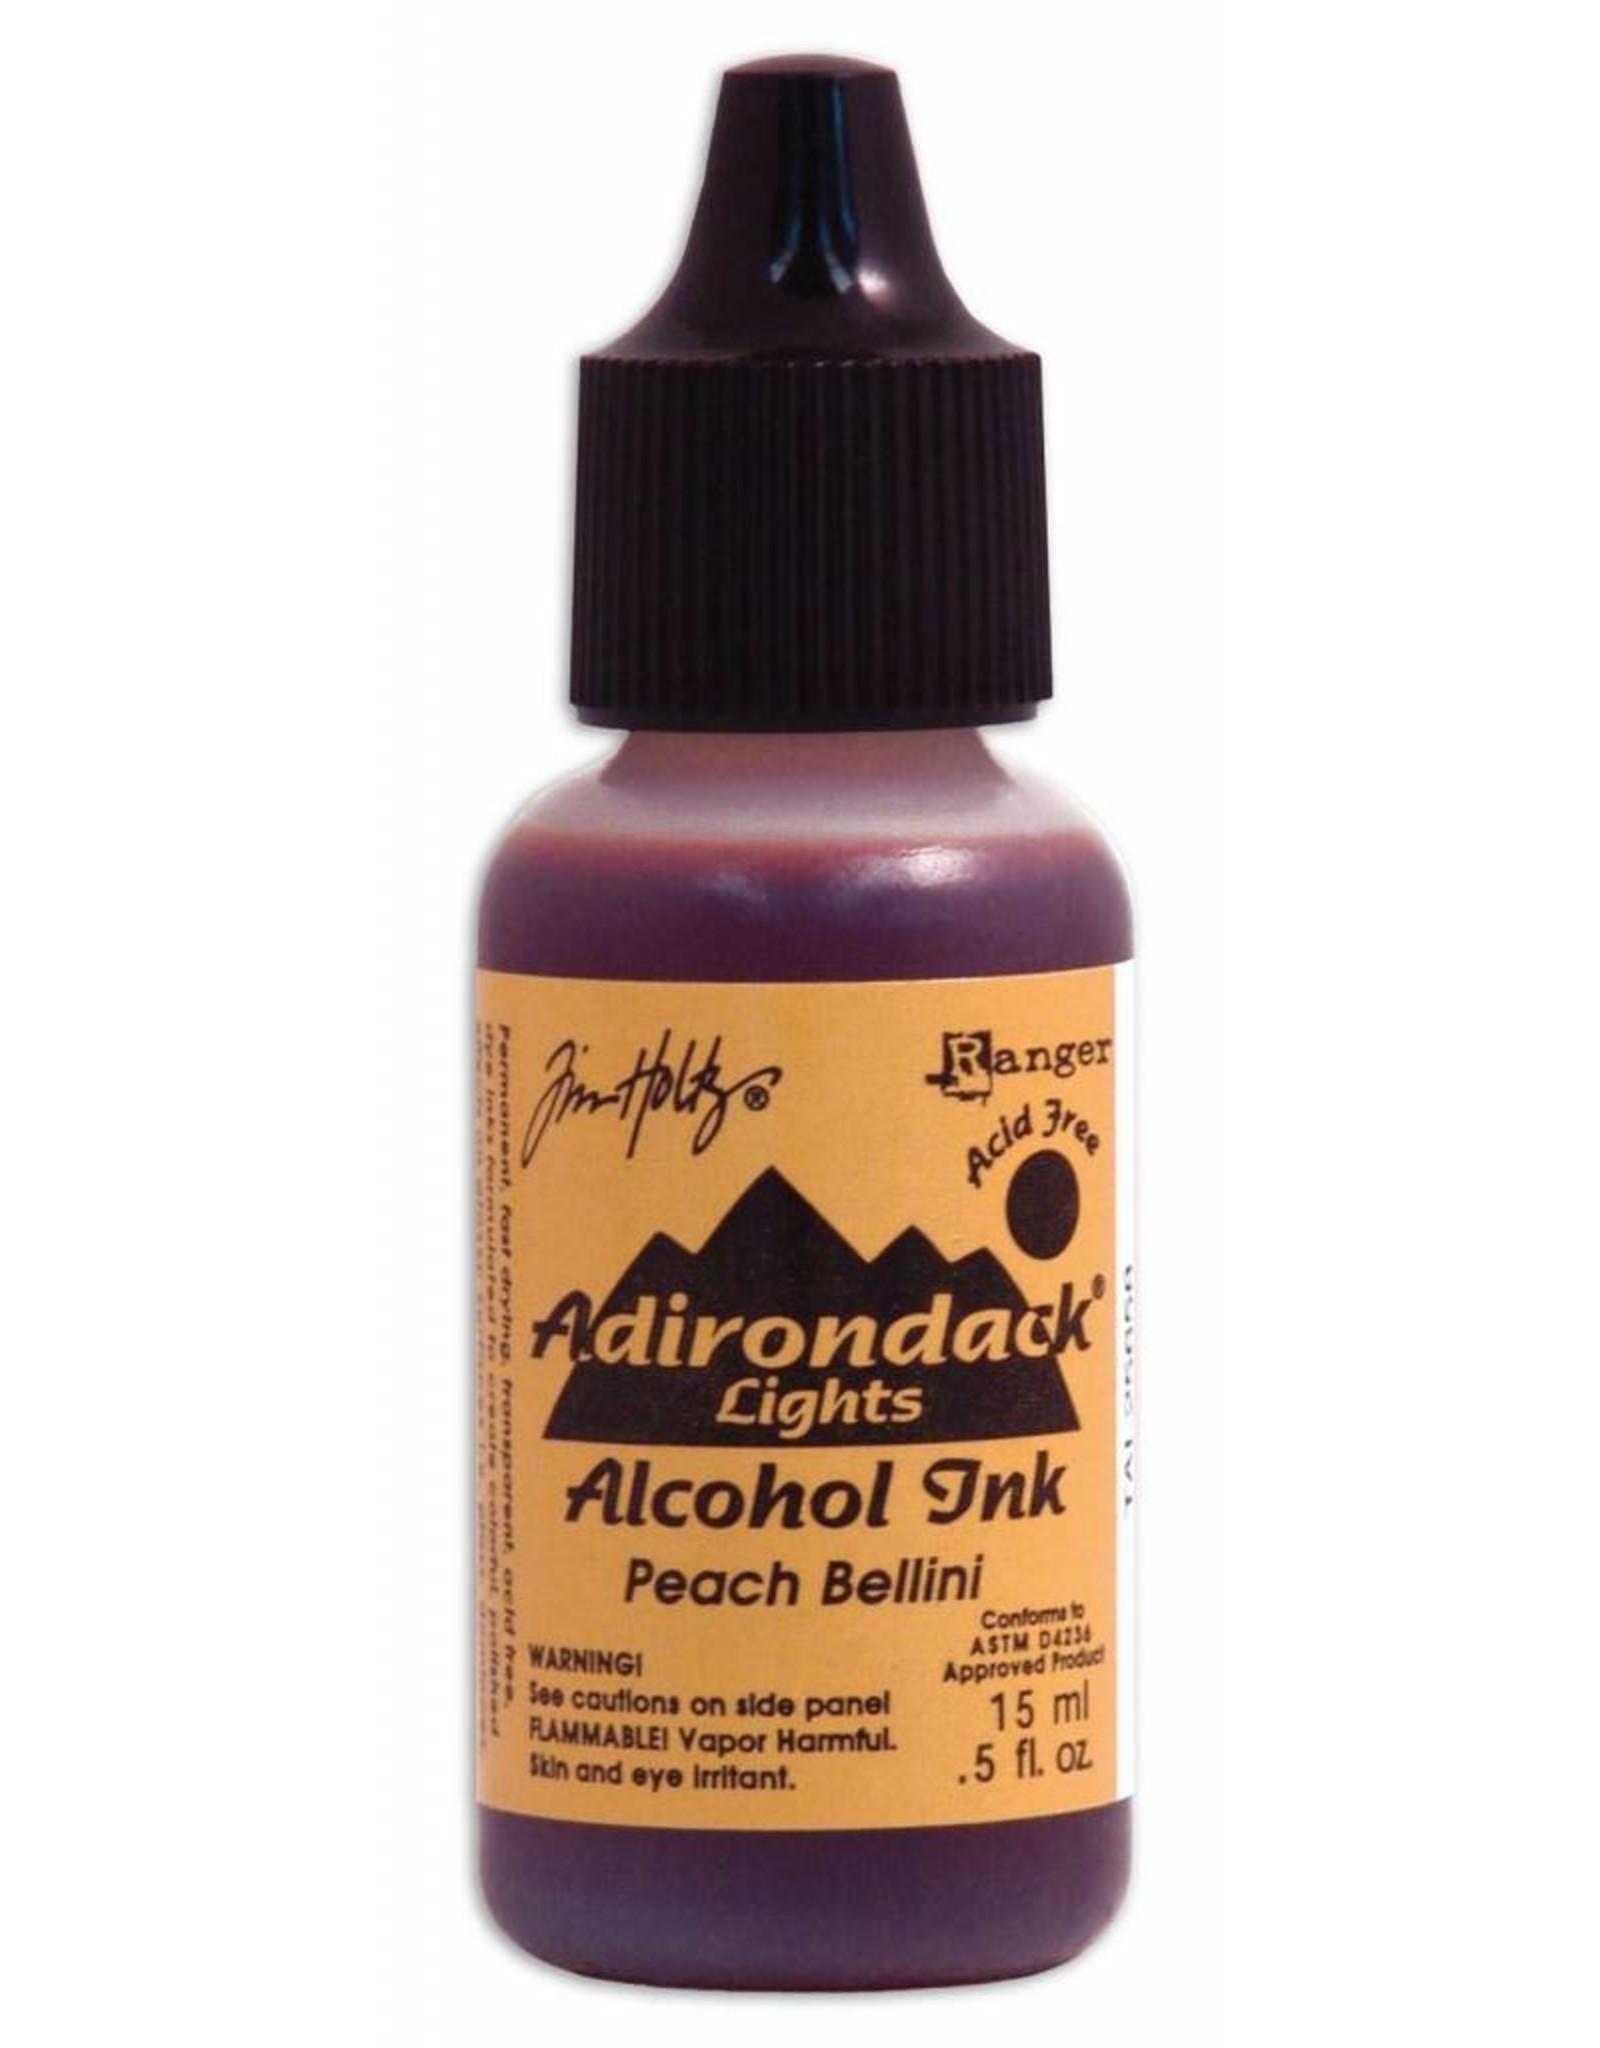 Adirondack Adirondack alcohol ink open stock lights peach bellini